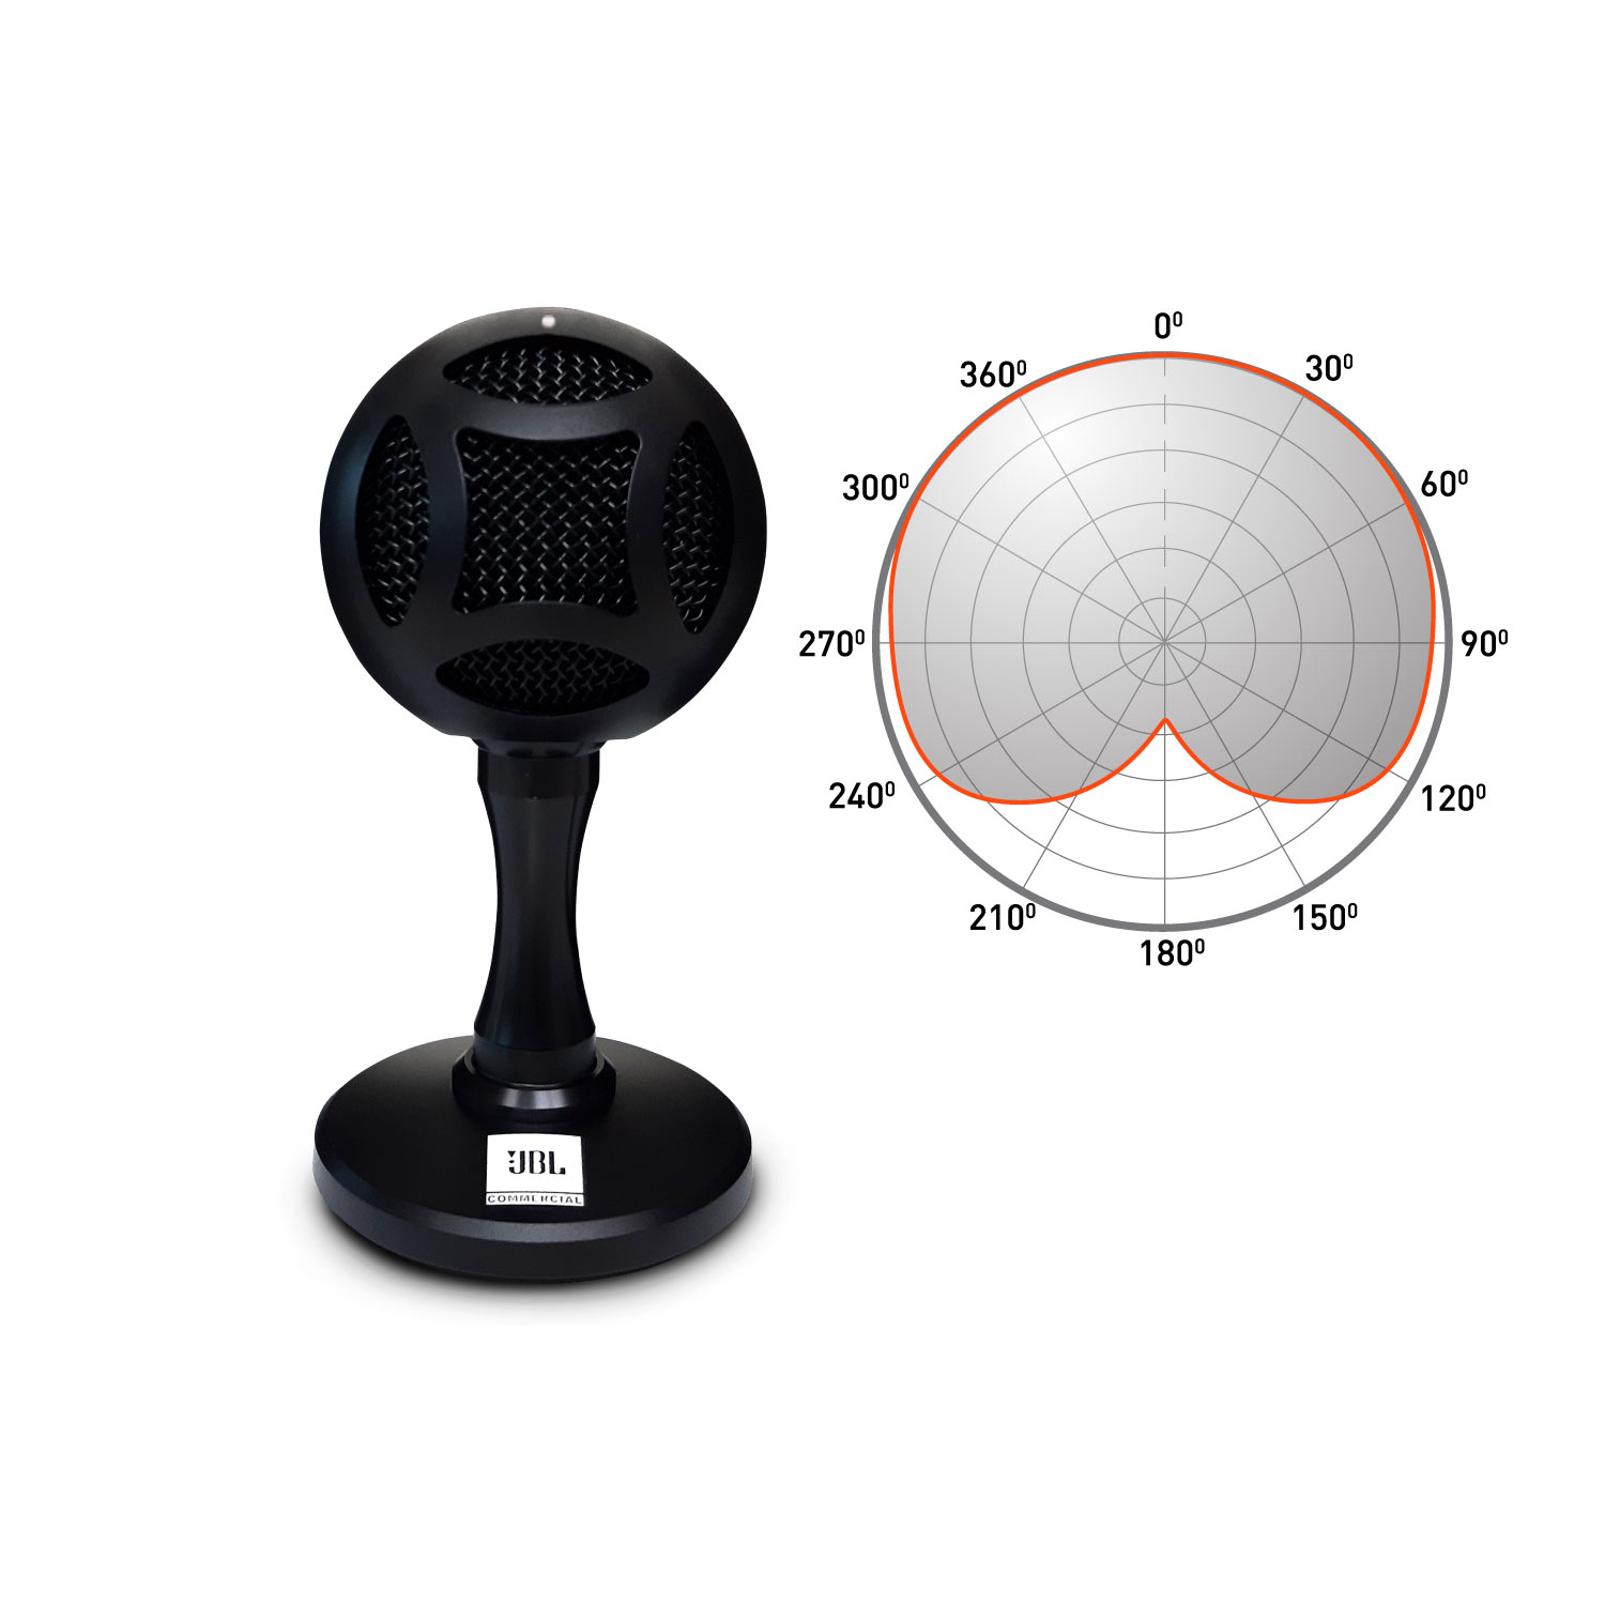 WFH100 - Black - USB powered speakers and Mini USB Microphone Bundle - Detailshot 4